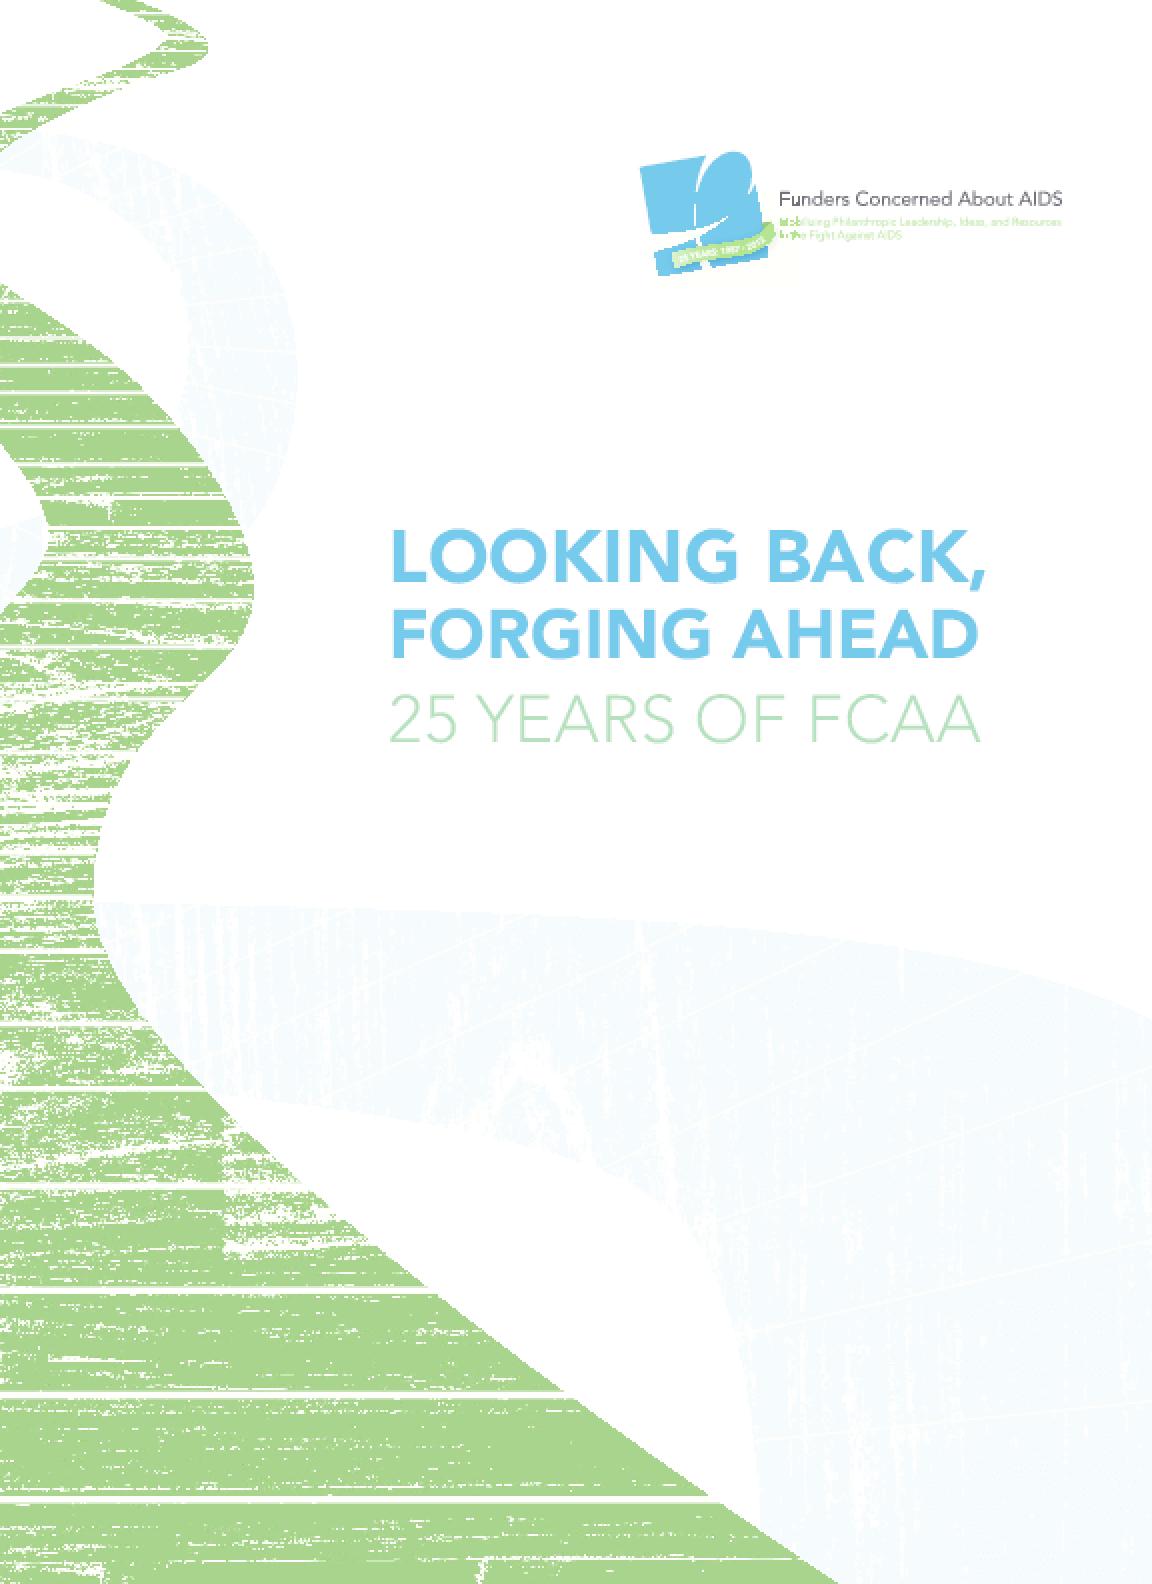 Looking Back, Forging Ahead: 25 Years of FCAA